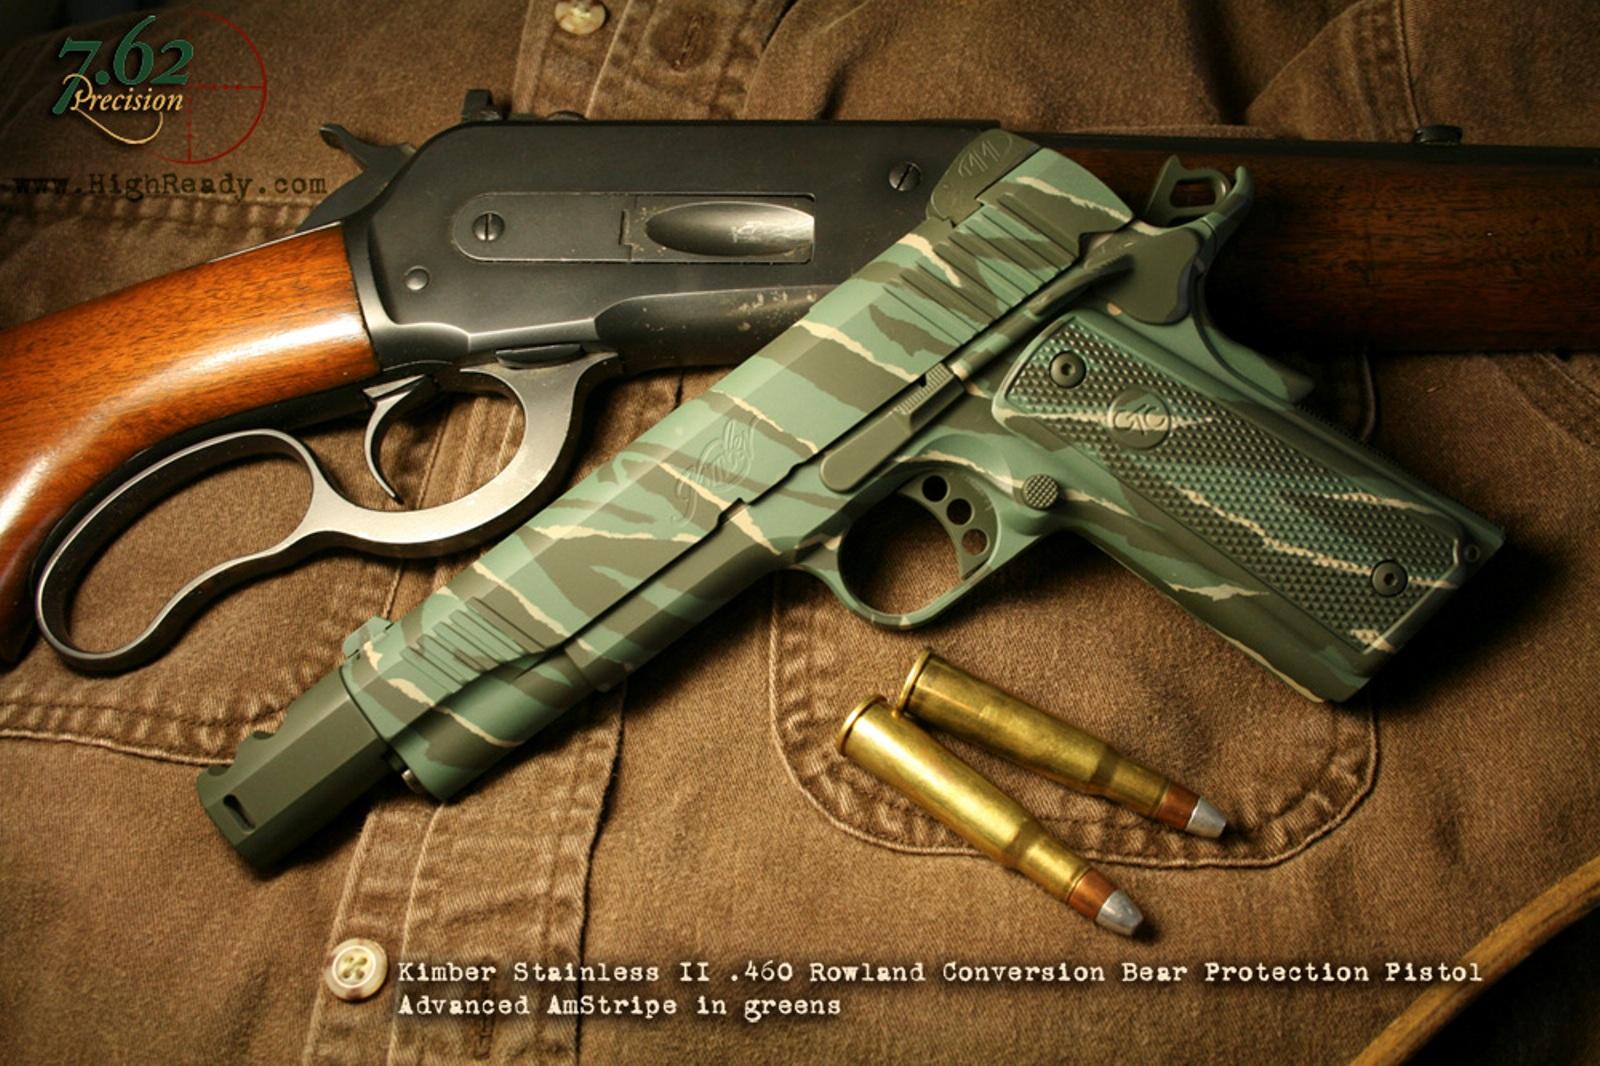 Pin Kimber Gun 1440x900 Hd Wallpaper Jootix Wallpapers 1600x1066